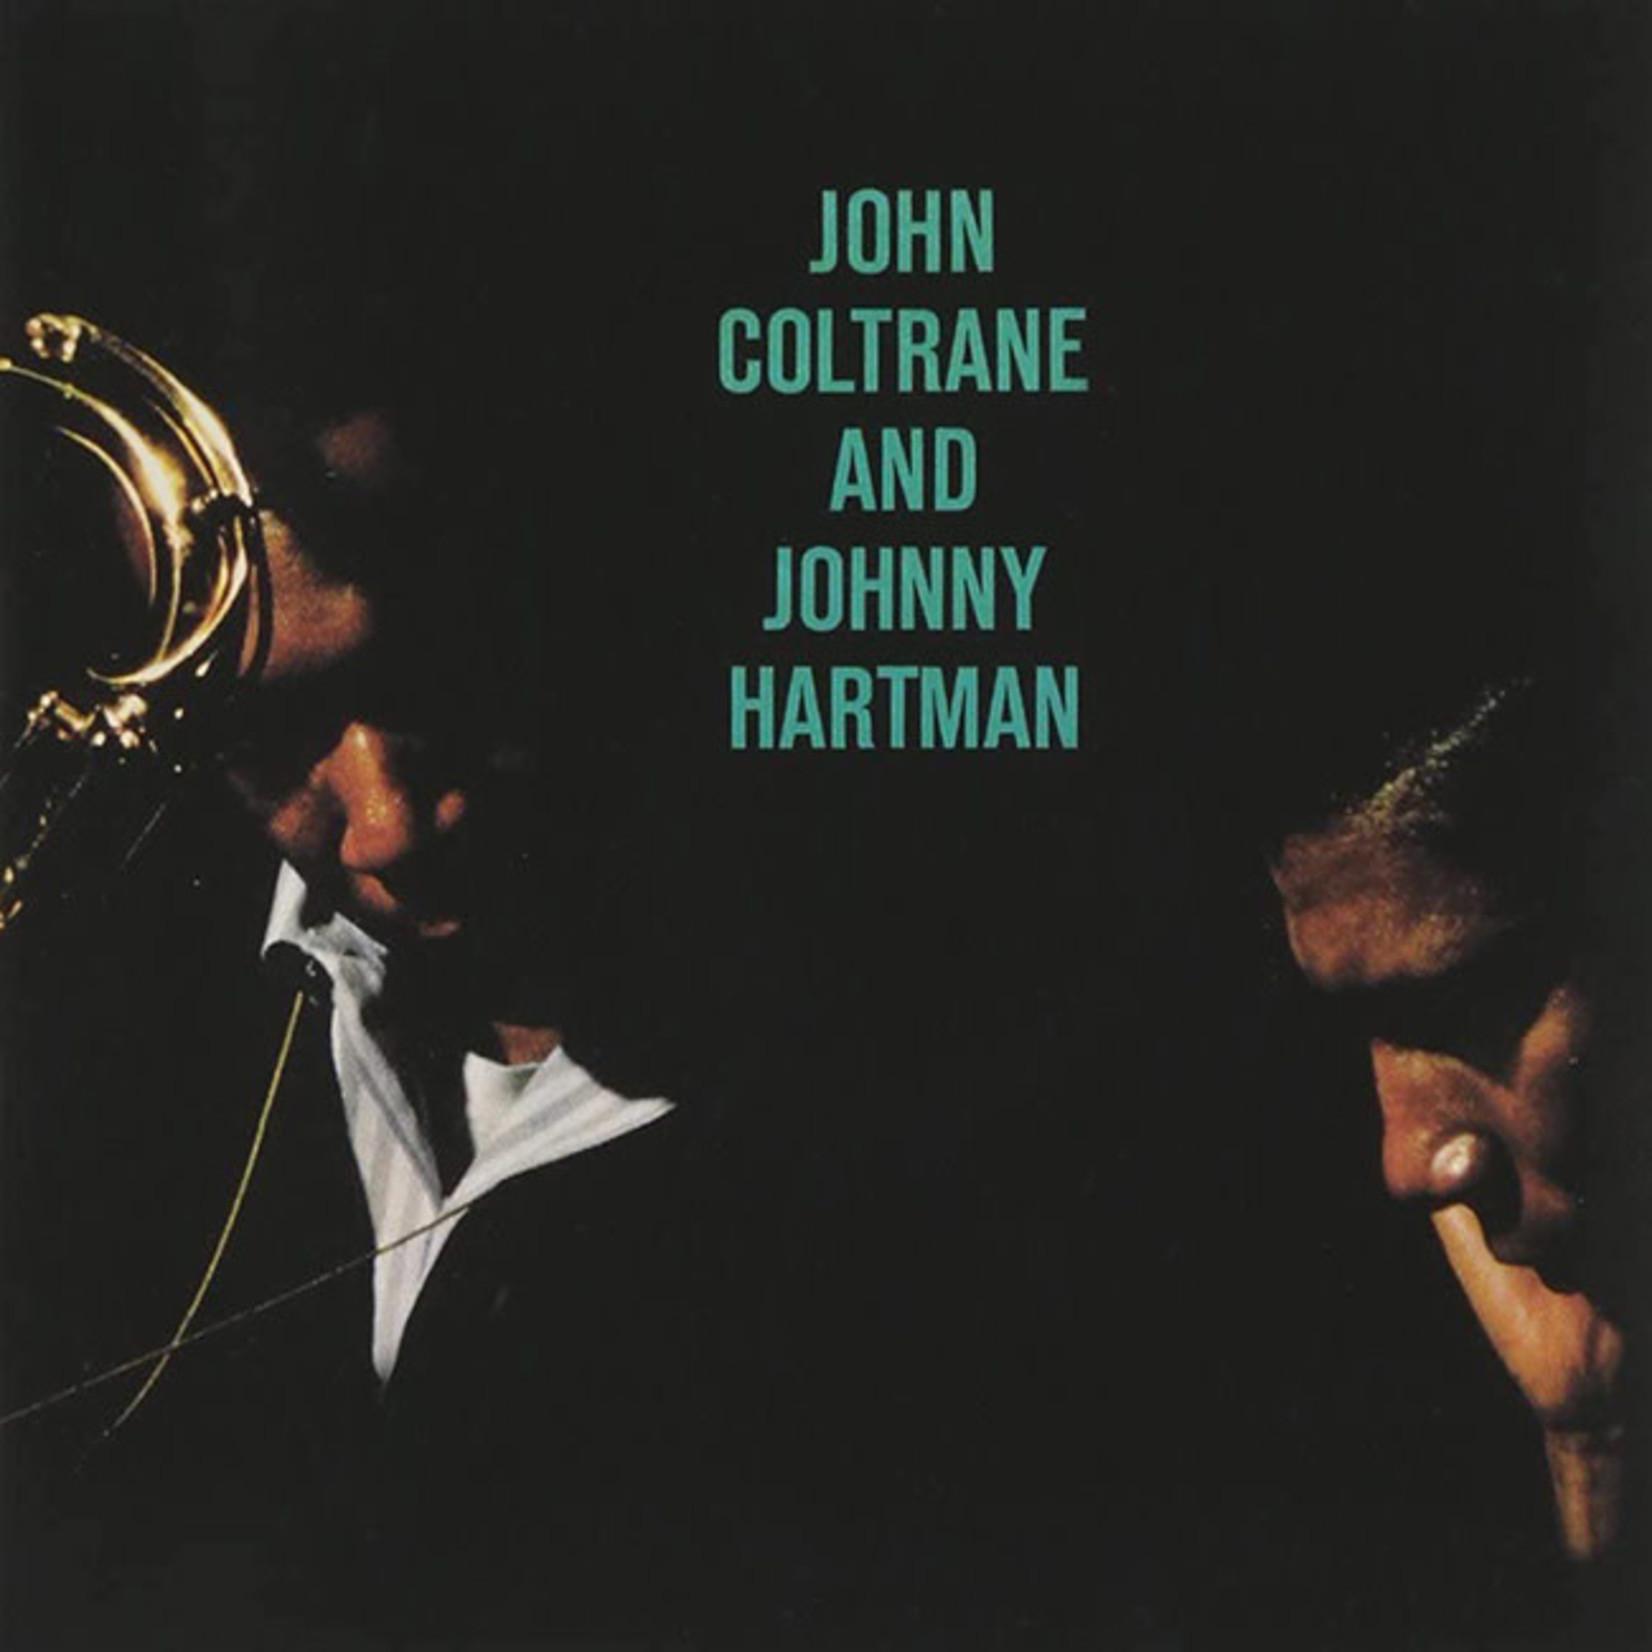 [New] Coltrane, John & Johnny Hartman: John Coltrane & Johnny Hartman